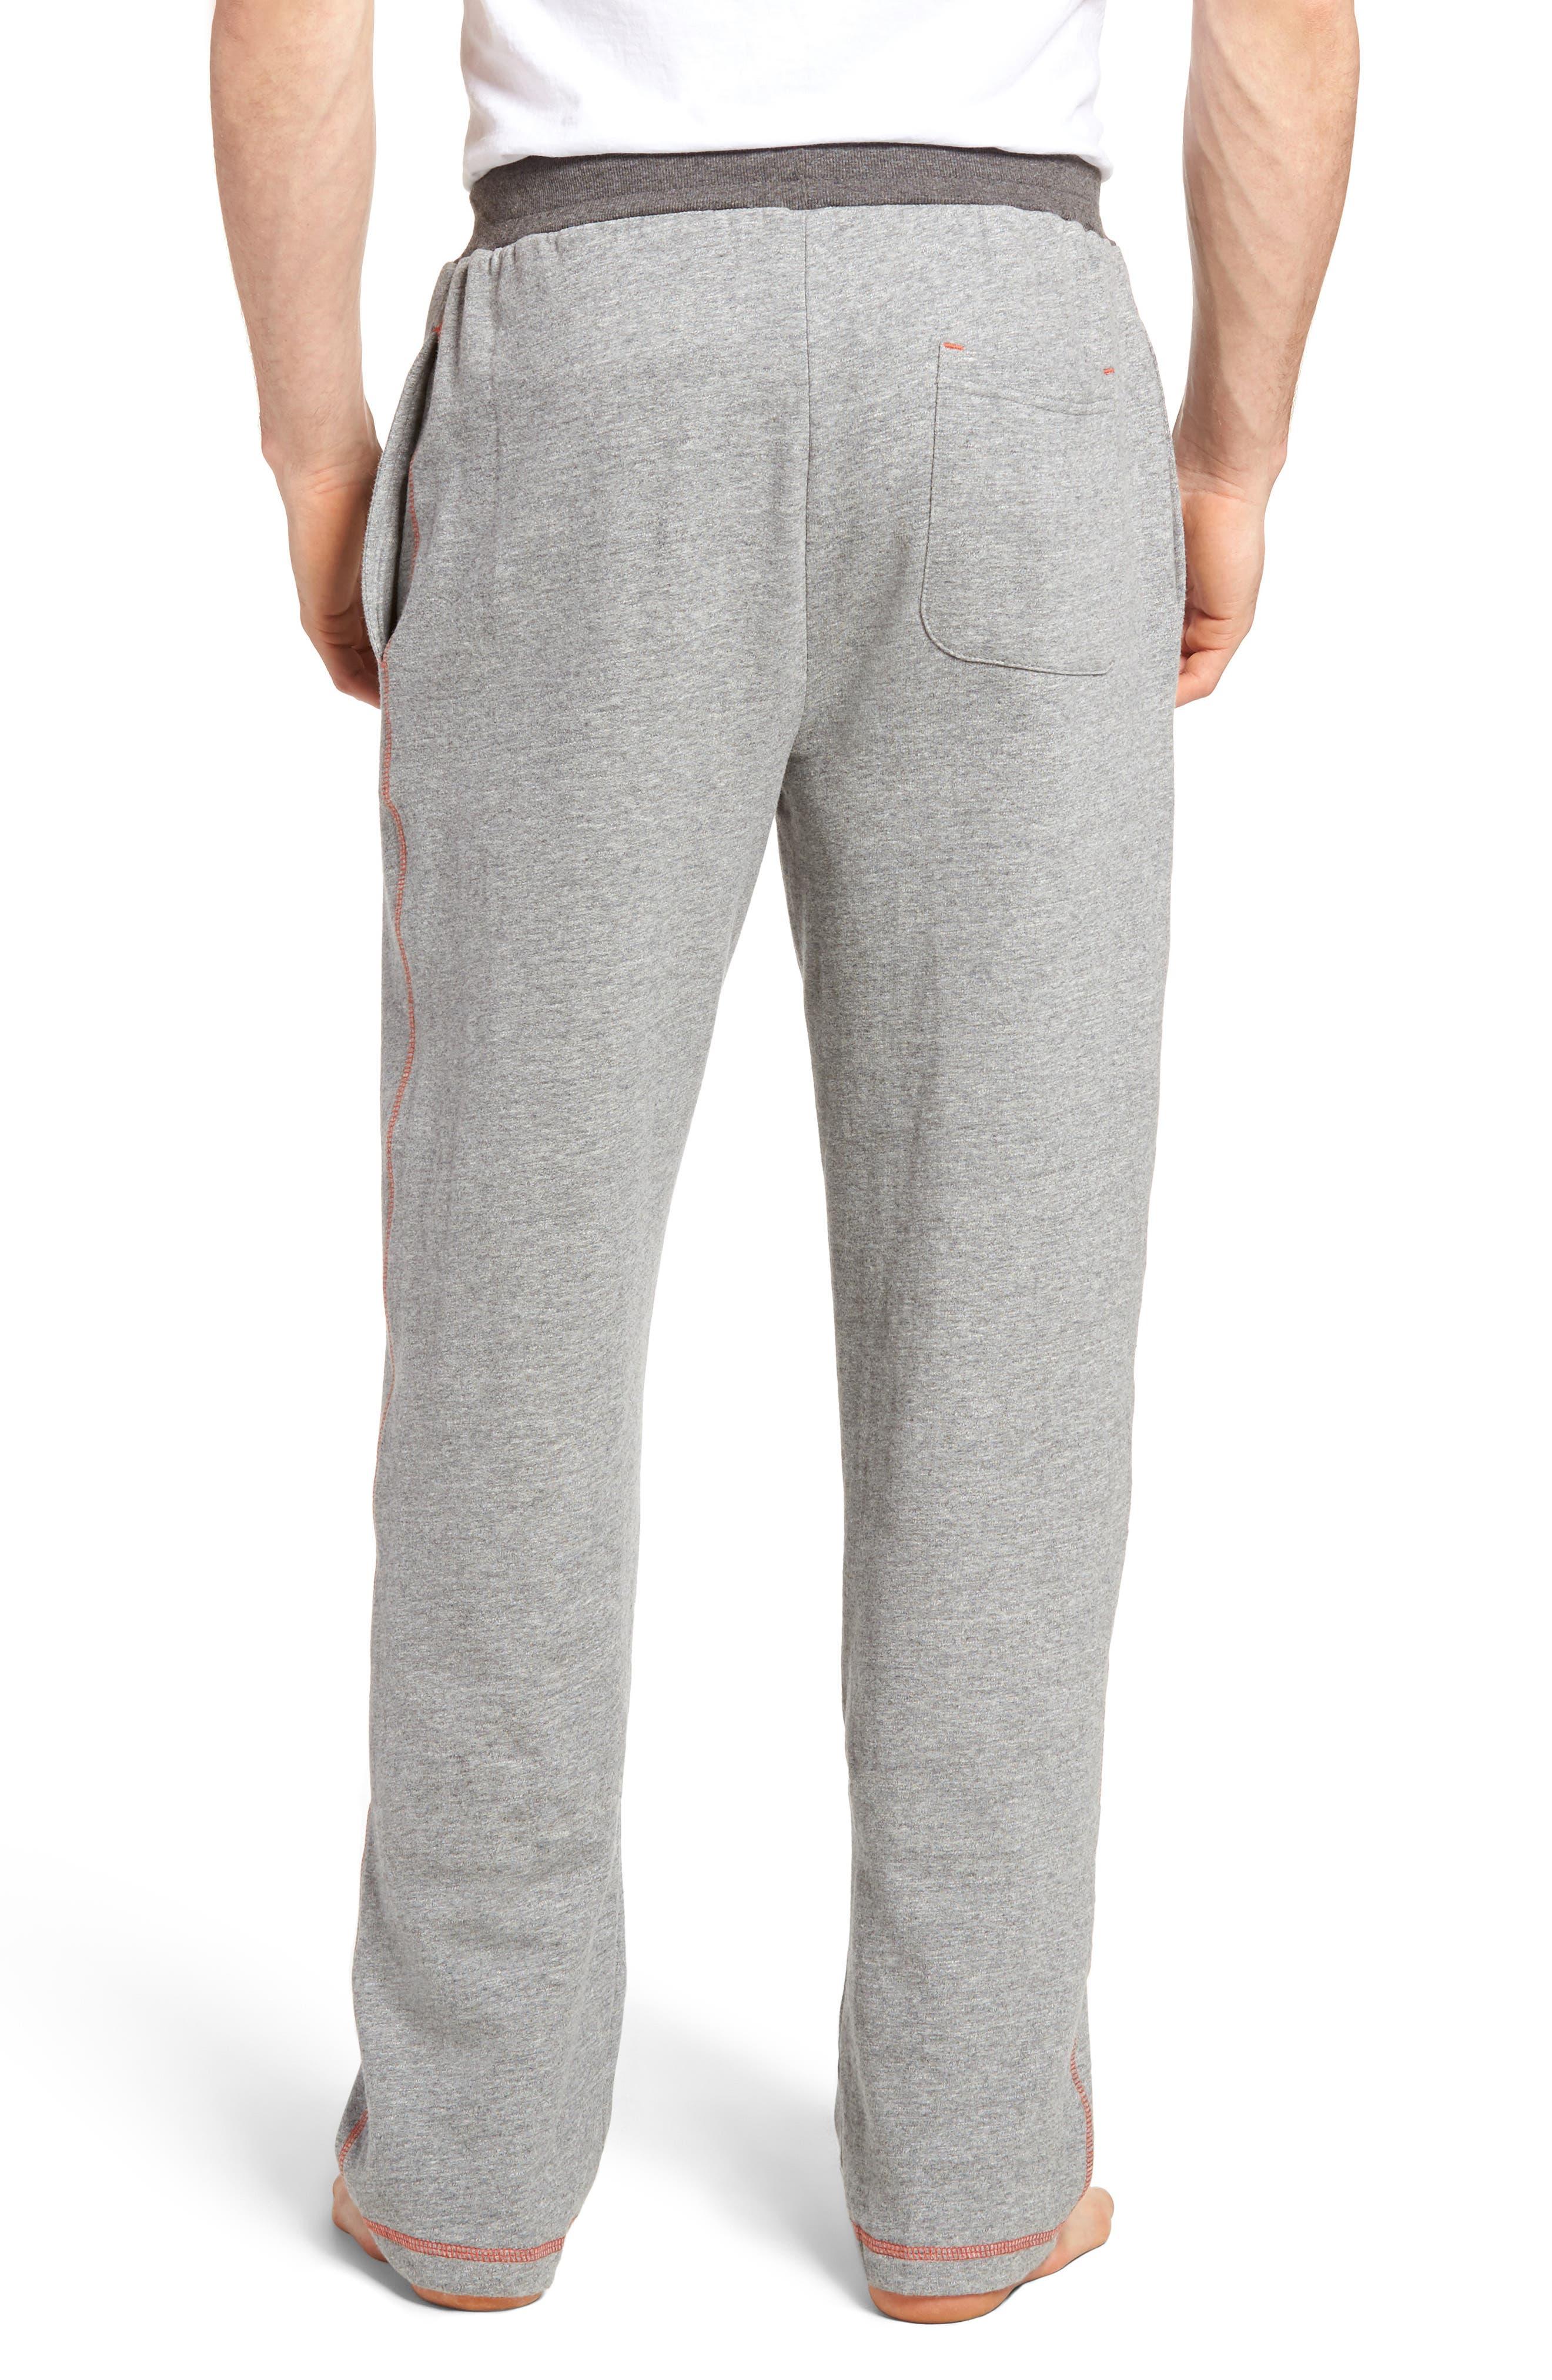 Bhooka Cotton Blend Lounge Pants,                             Alternate thumbnail 2, color,                             020